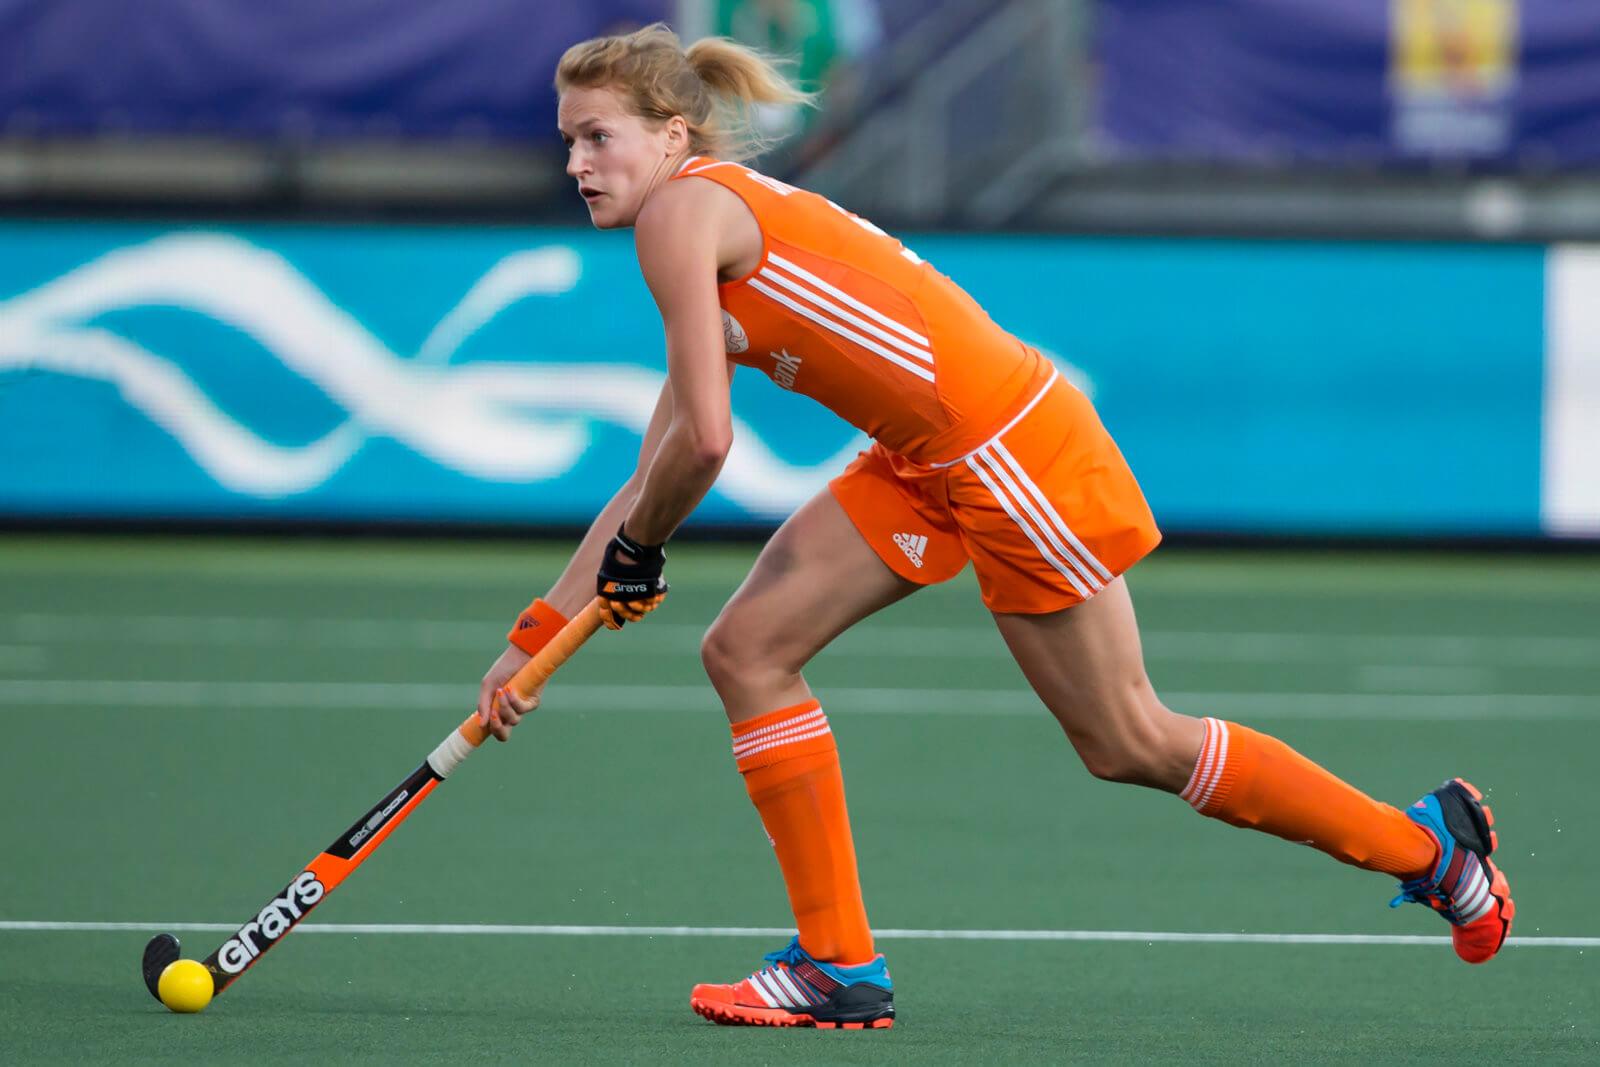 THE HAGUE - Rabobank Hockey World Cup 2014 - 12-06-2014 - WOMEN - SEMI-FINAL THE NETHERLANDS - ARGENTINA 4-0 - Carlien Dirkse van den Heuvel. Copyright: Willem Vernes